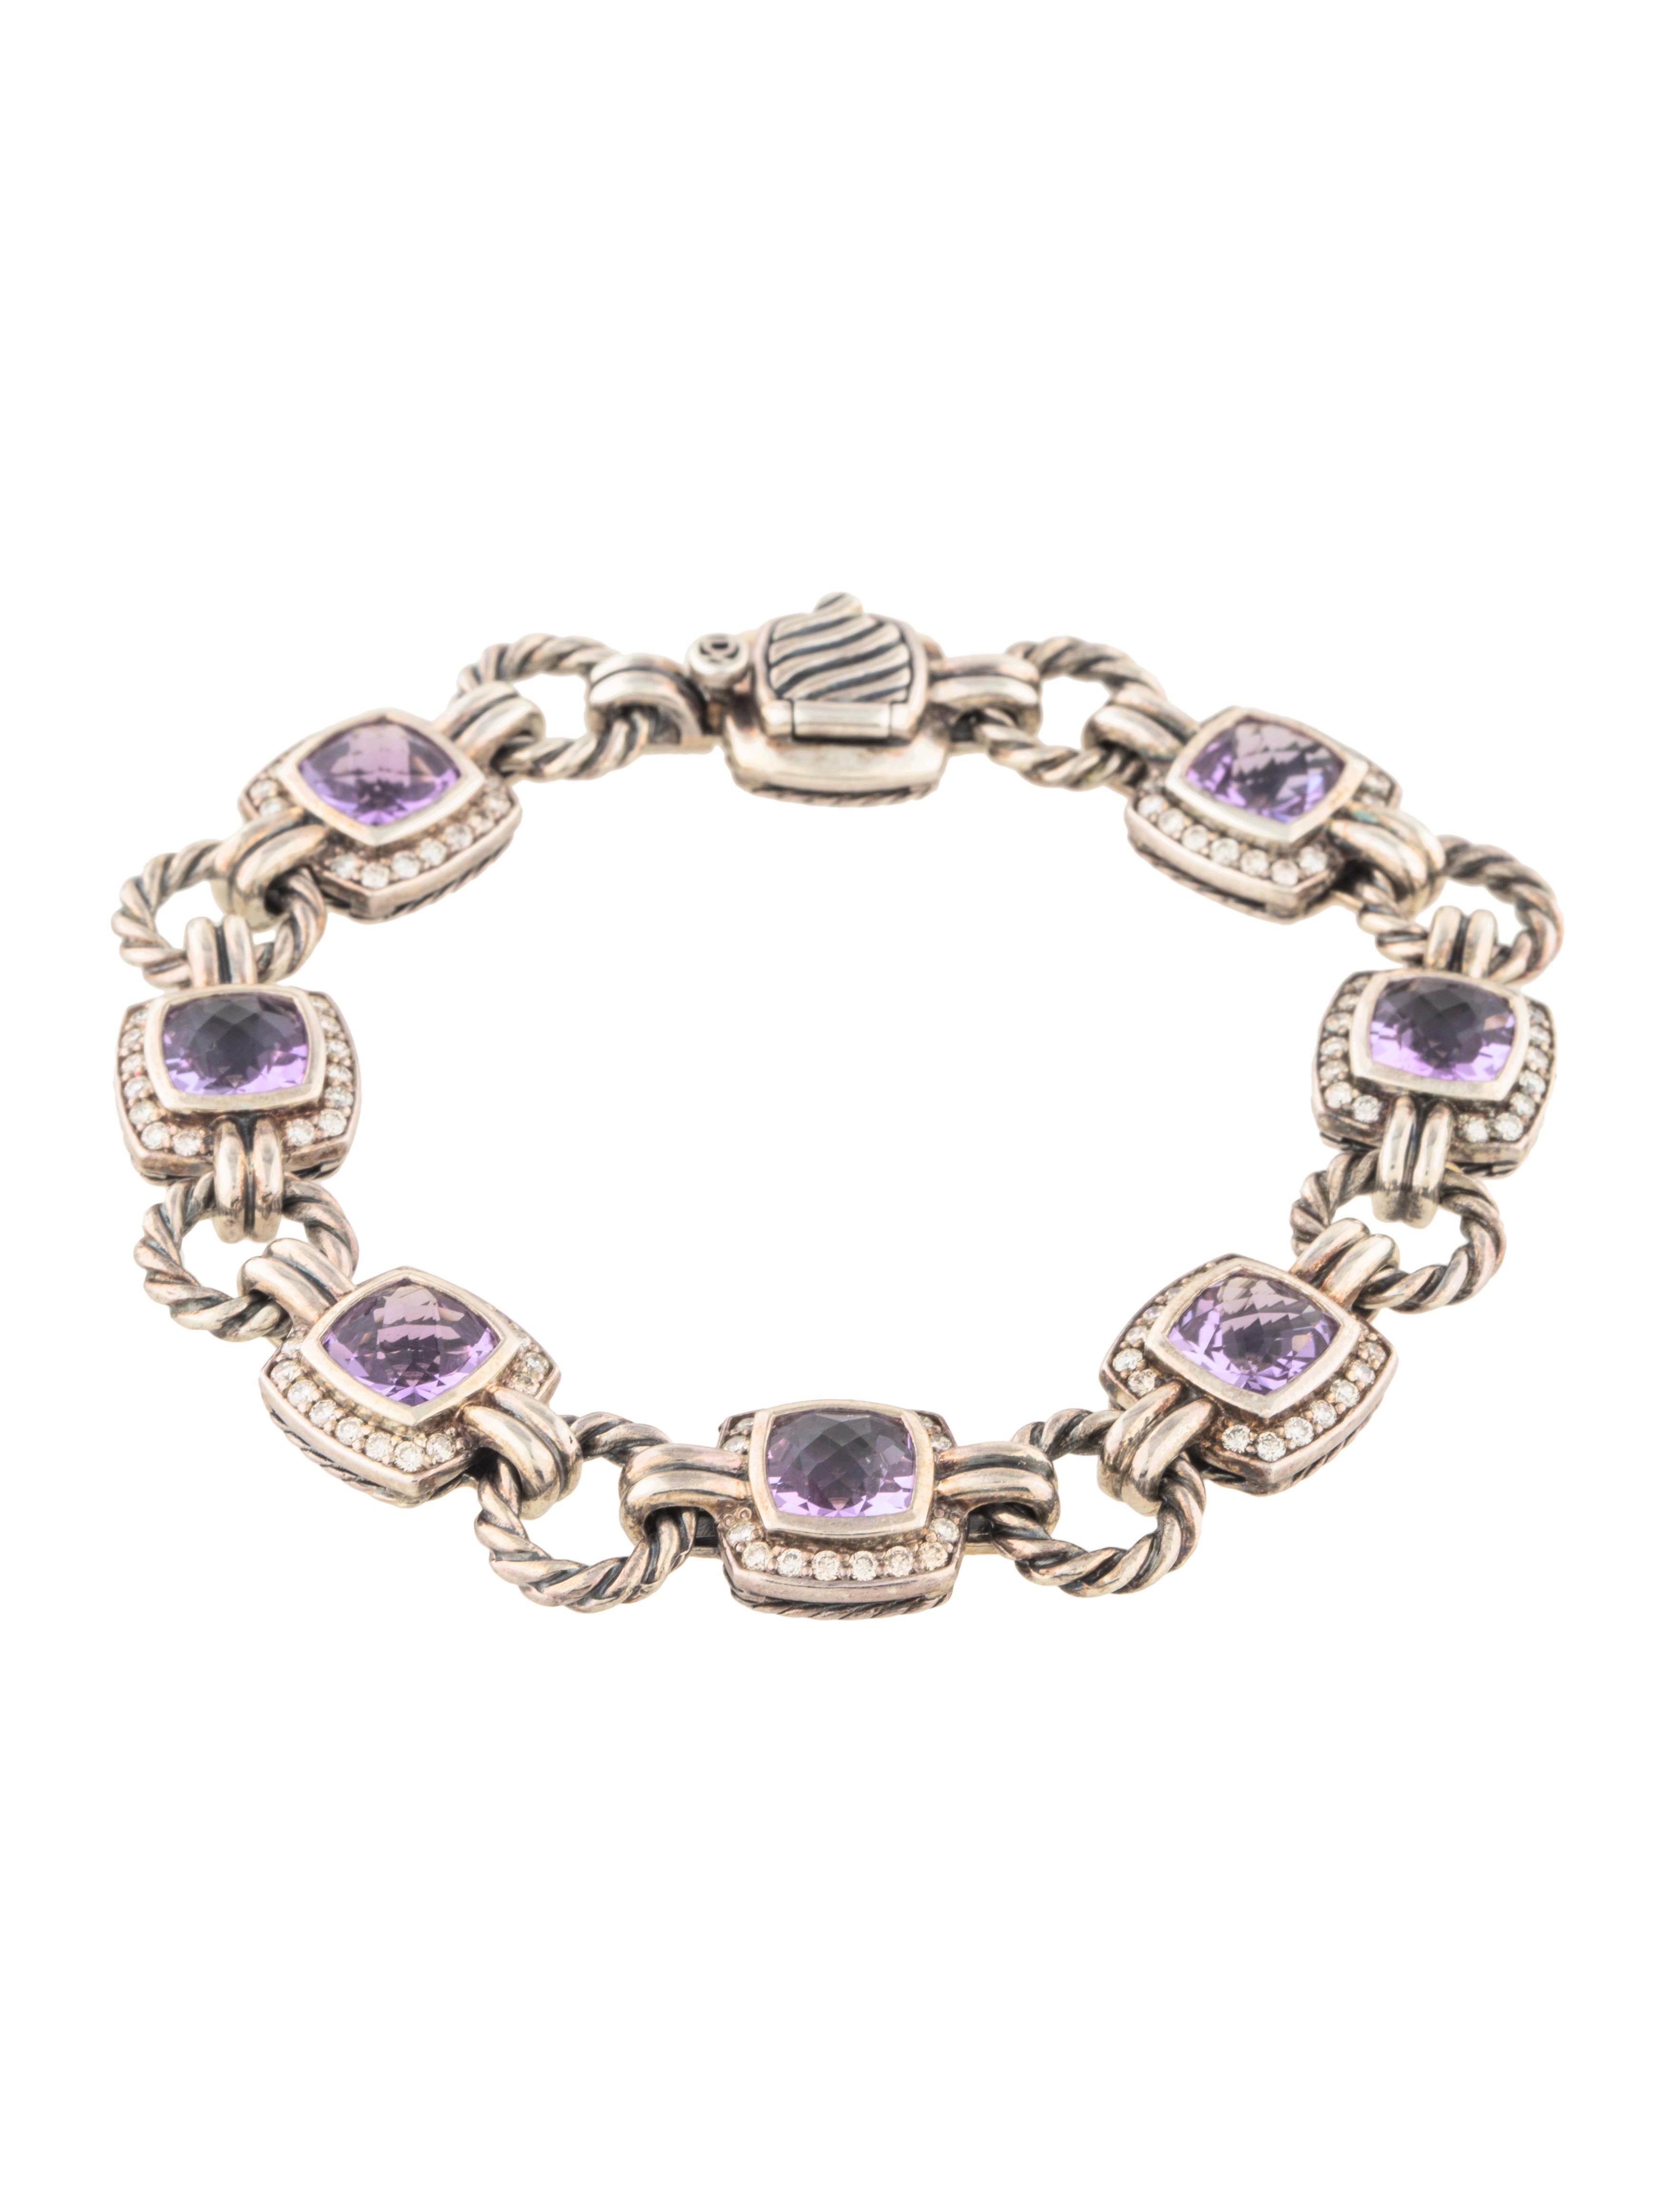 David Yurman Amethyst Diamond Renaissance Bracelet Bracelets Dvy42883 The Realreal